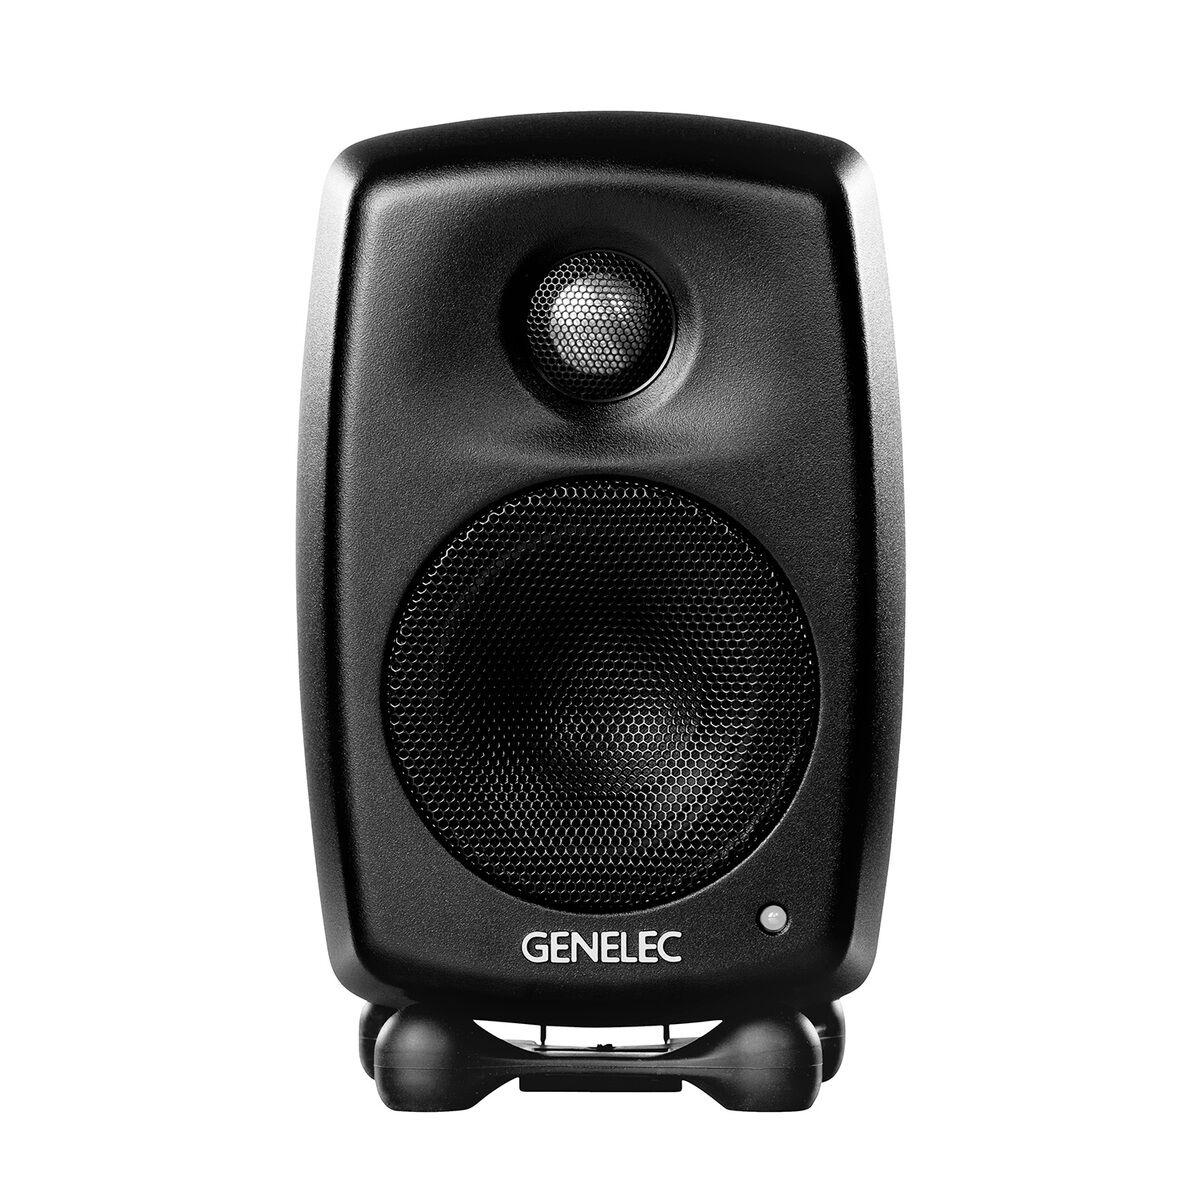 Genelec G One (B) active speaker, black